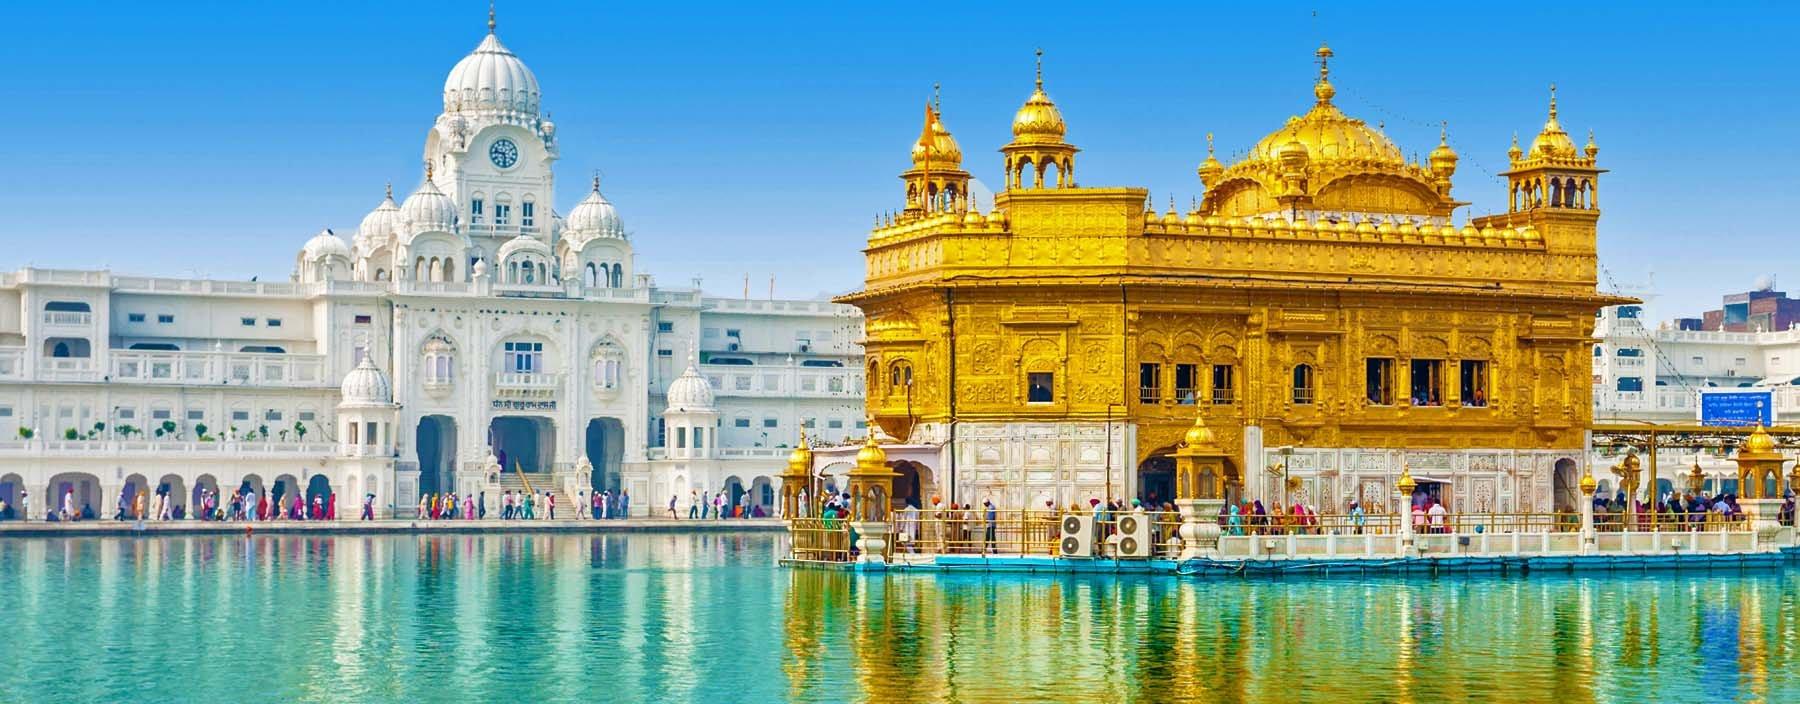 in, amritsar, harmandir sahib.jpg